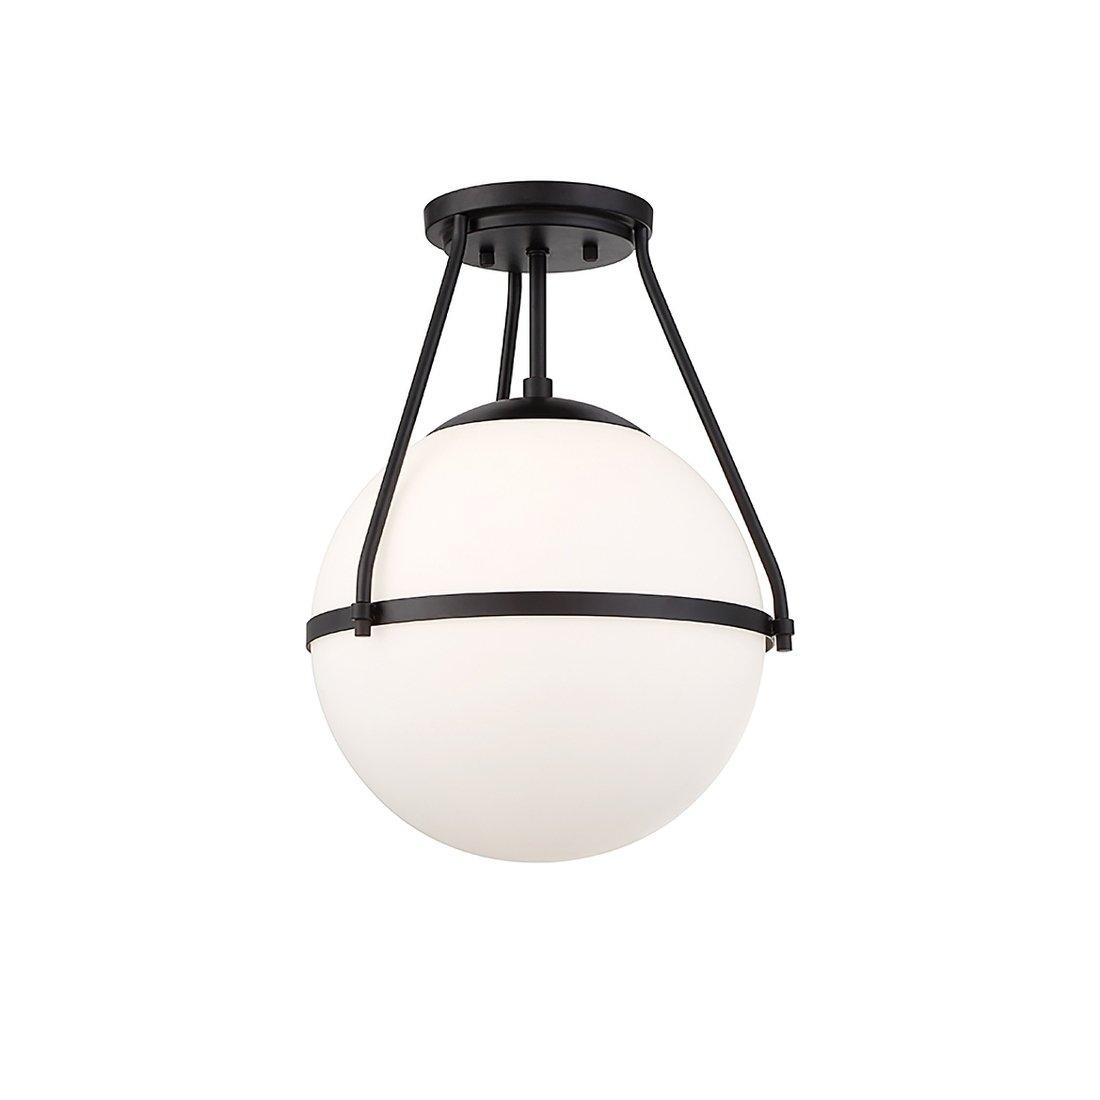 1-Light-Semi-Flush-fcdd8559-4cb0-4399-bcf5-4079445c21e3.jpg